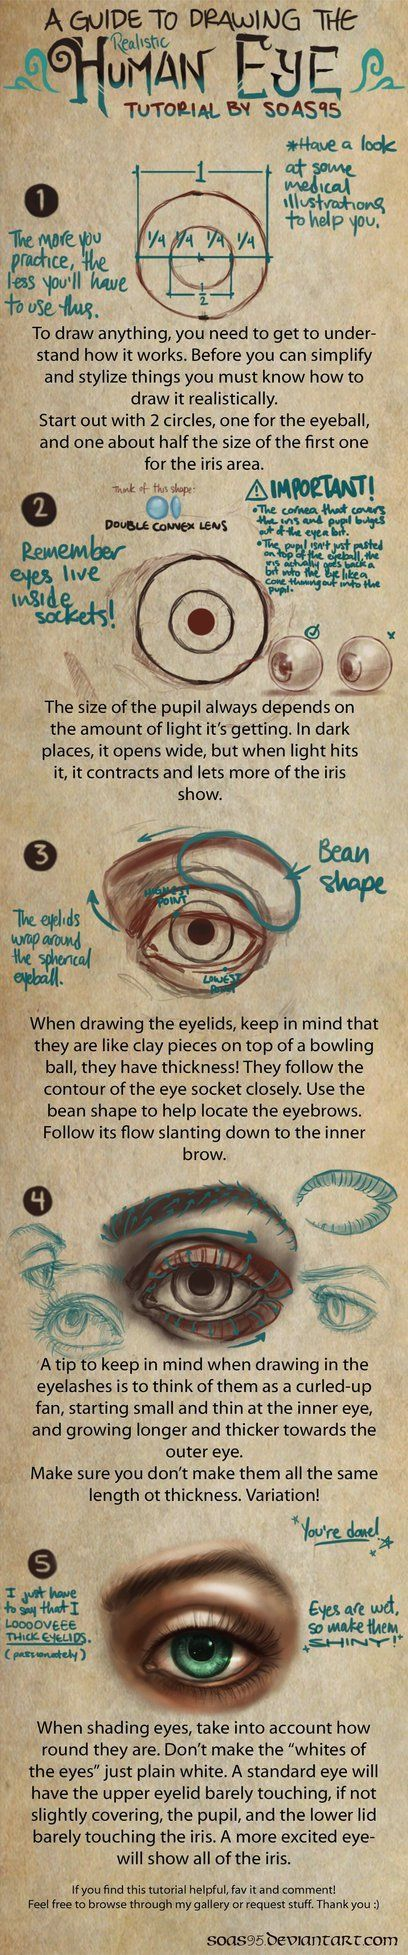 Human Eye- TUTORIAL by soas95